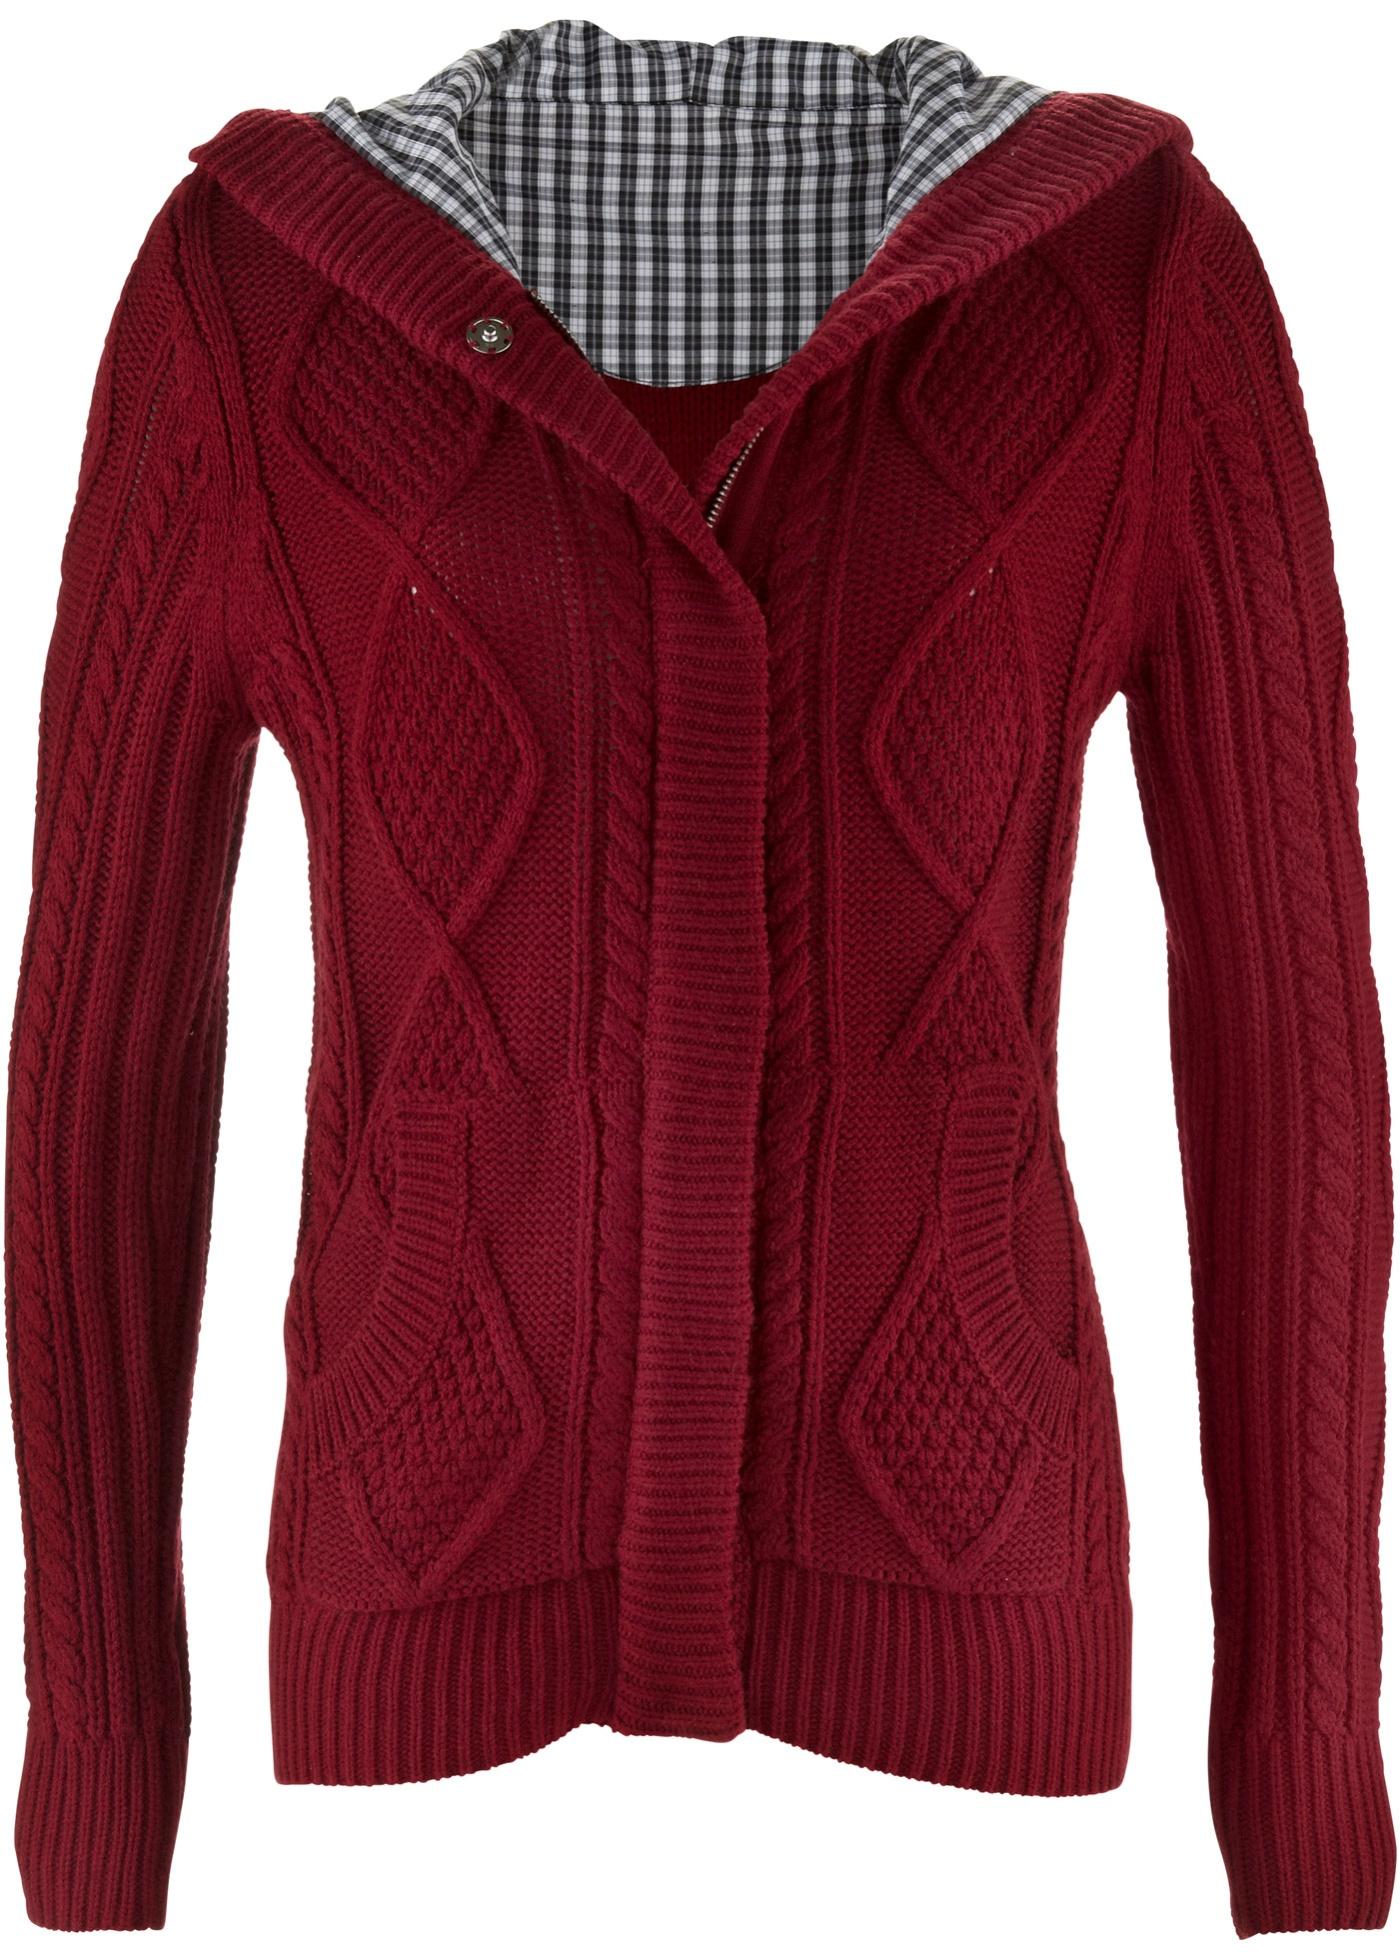 Pletený kabátek - Červená